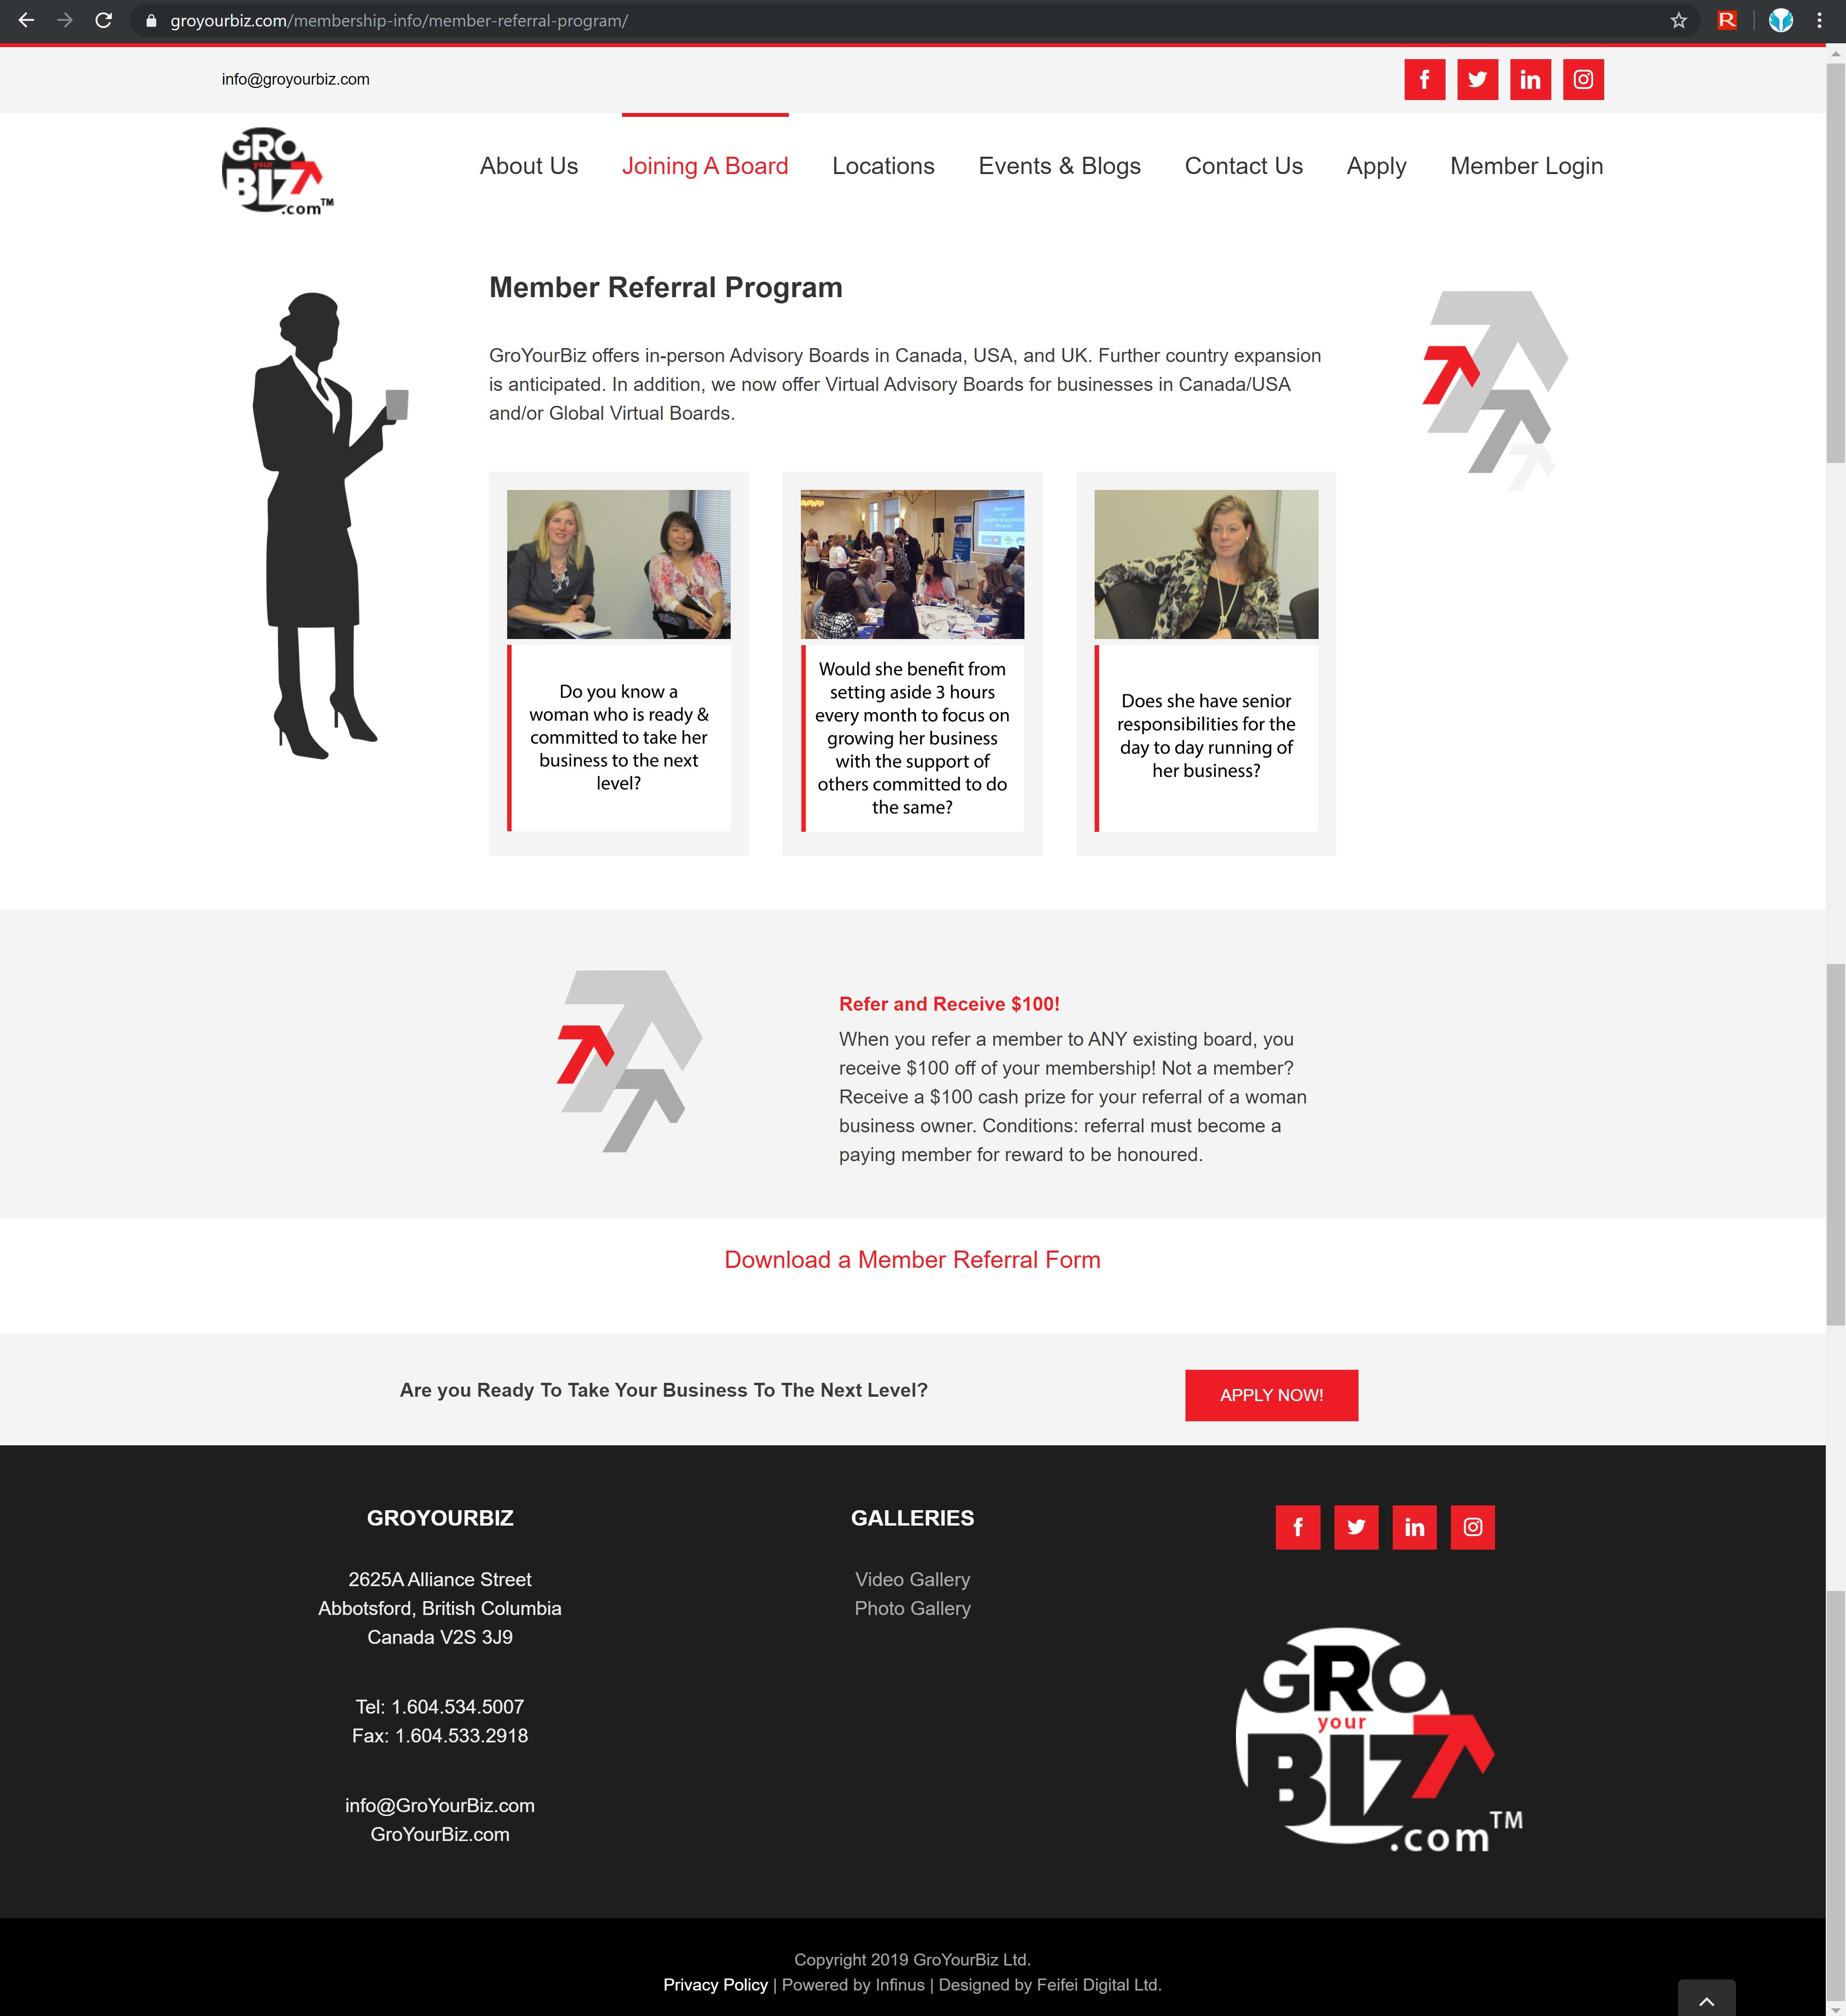 GroYourBiz Member Referral Program Page | User Interface and Front End Development | Feifei Digital | Monika Szucs